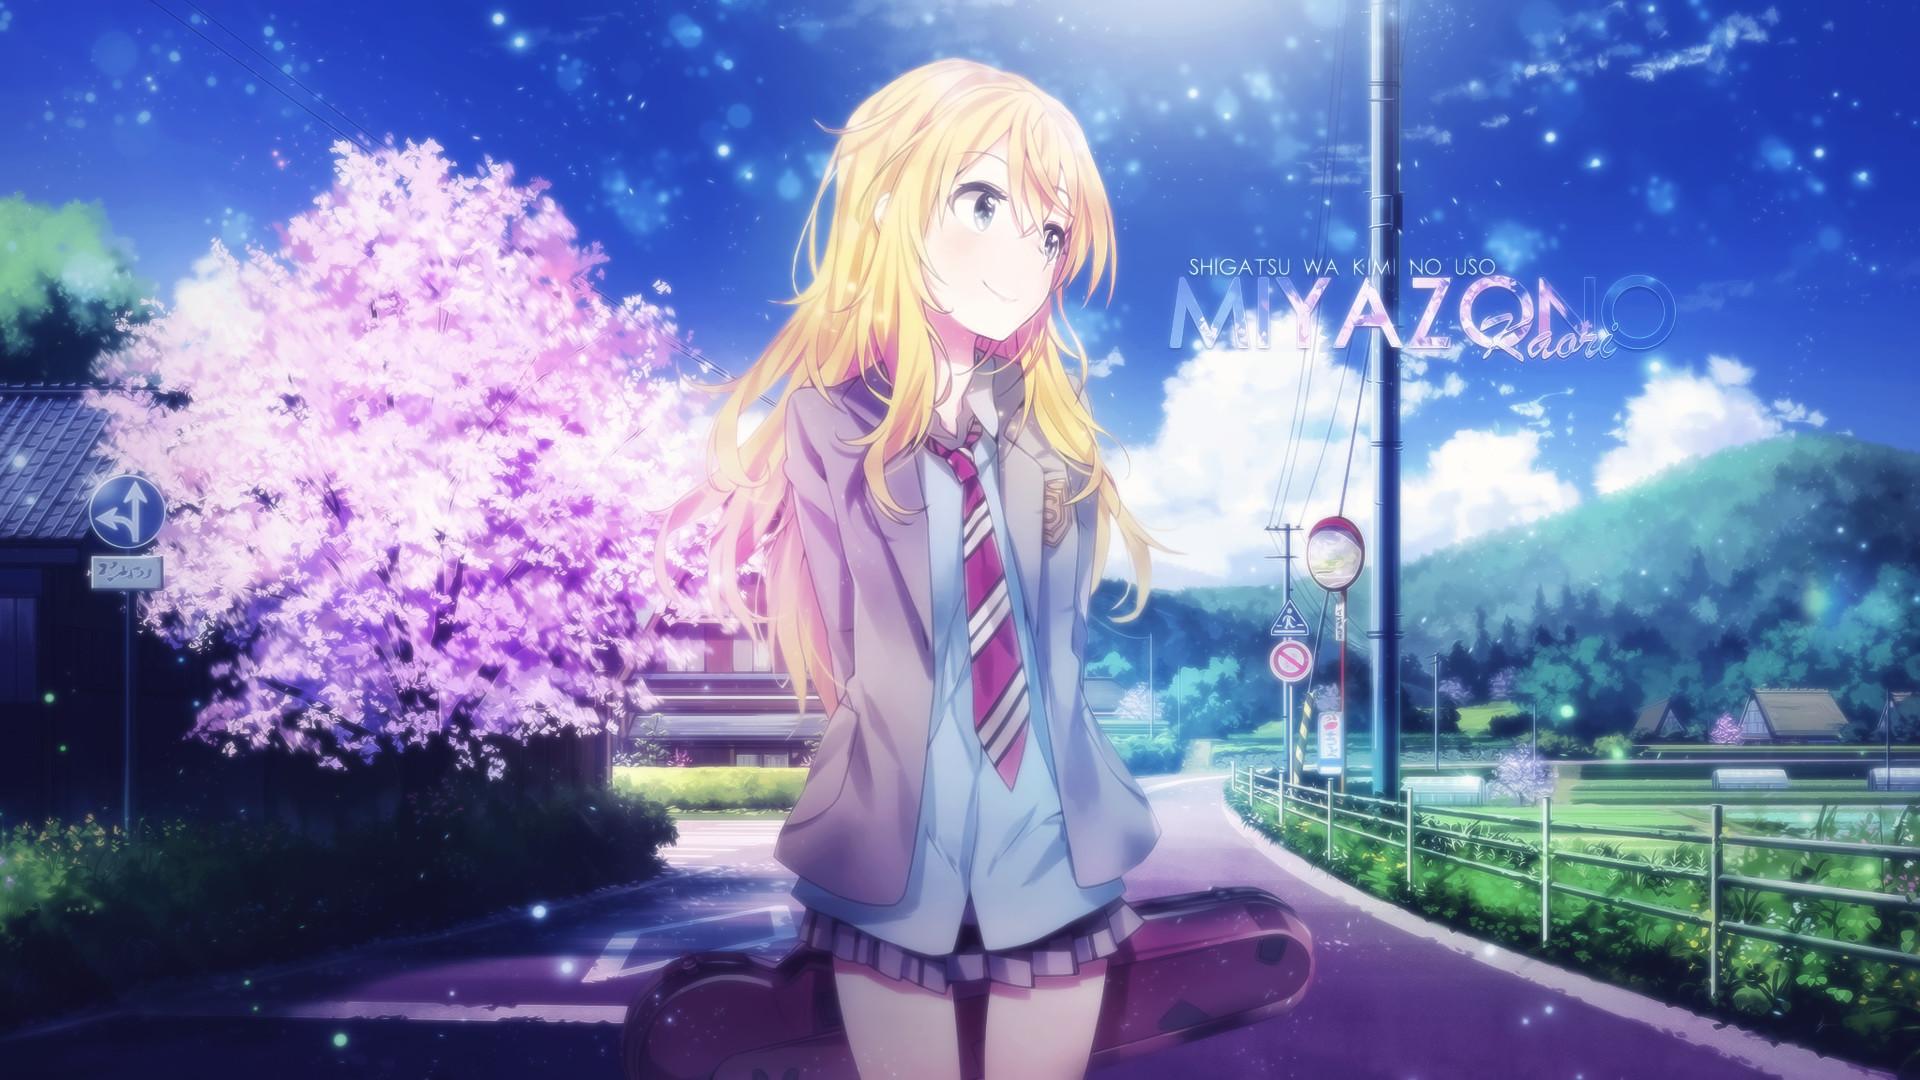 Anime Cherry Blossom Wallpaper 72 Images